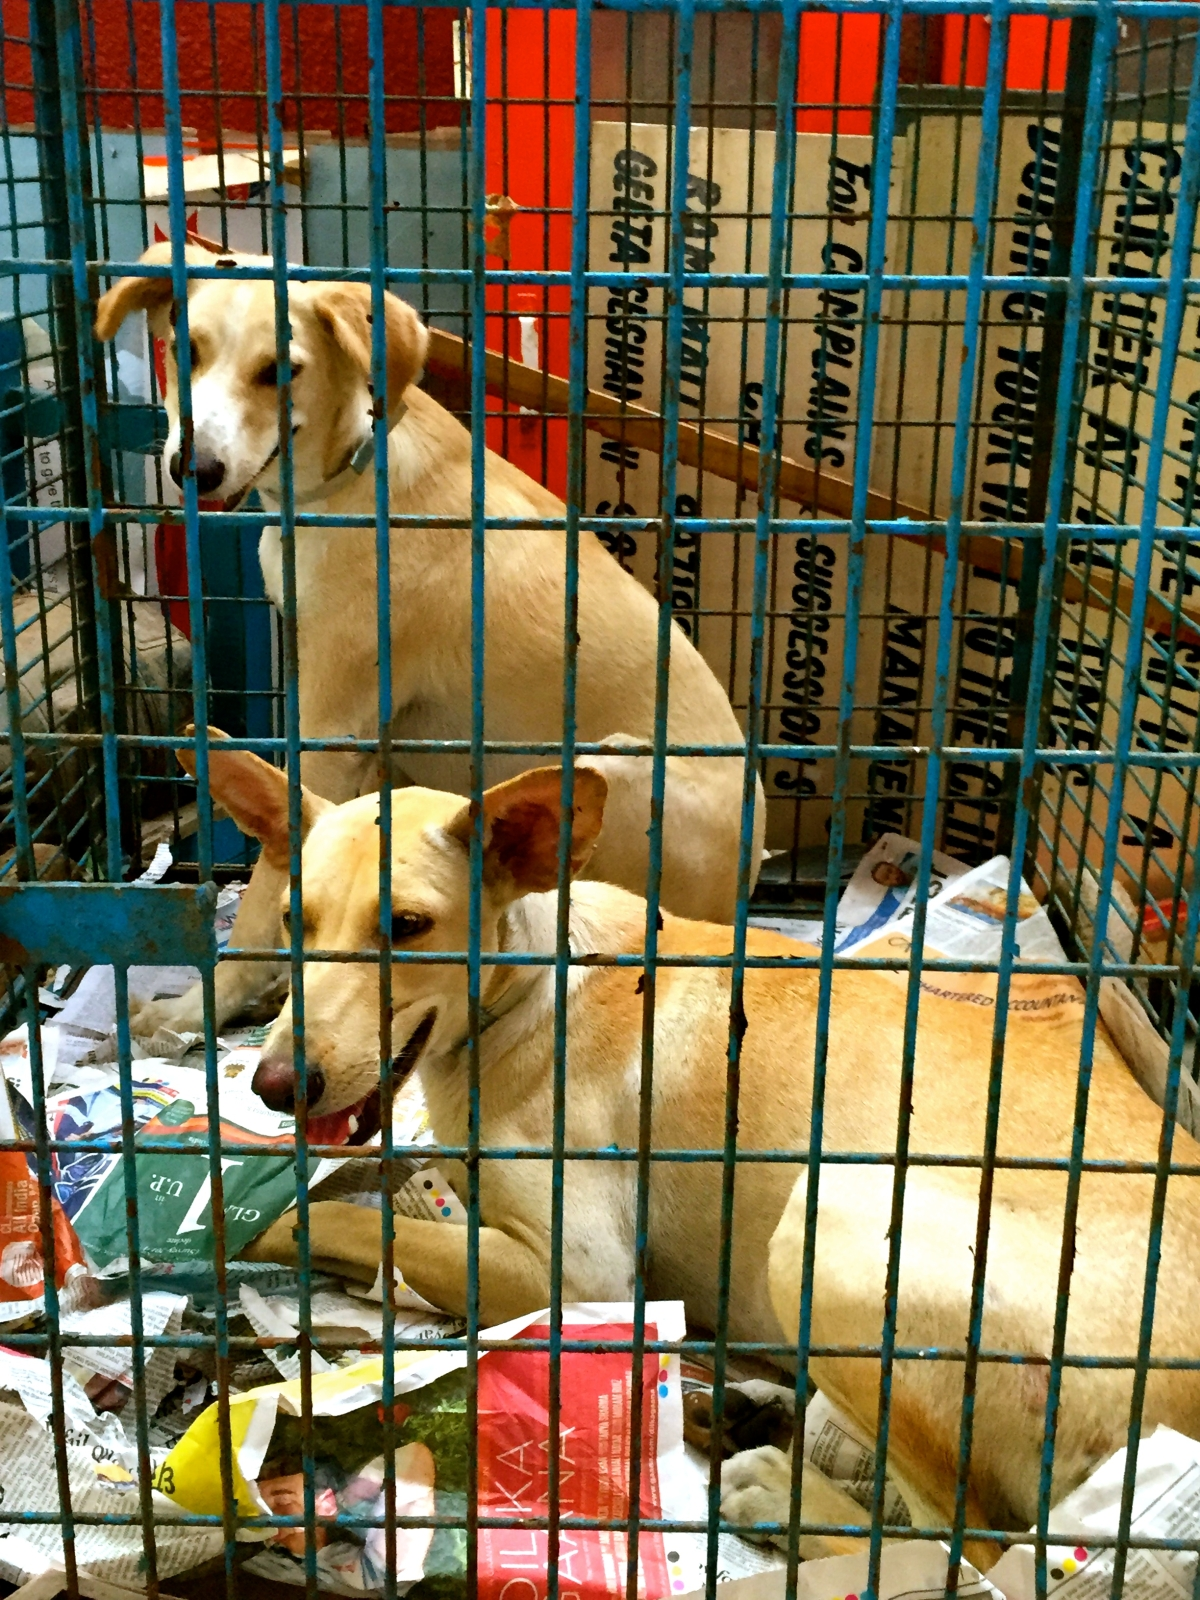 Animal Rescue NGO Friendicoes in Debt: No 'Ahimsa' for